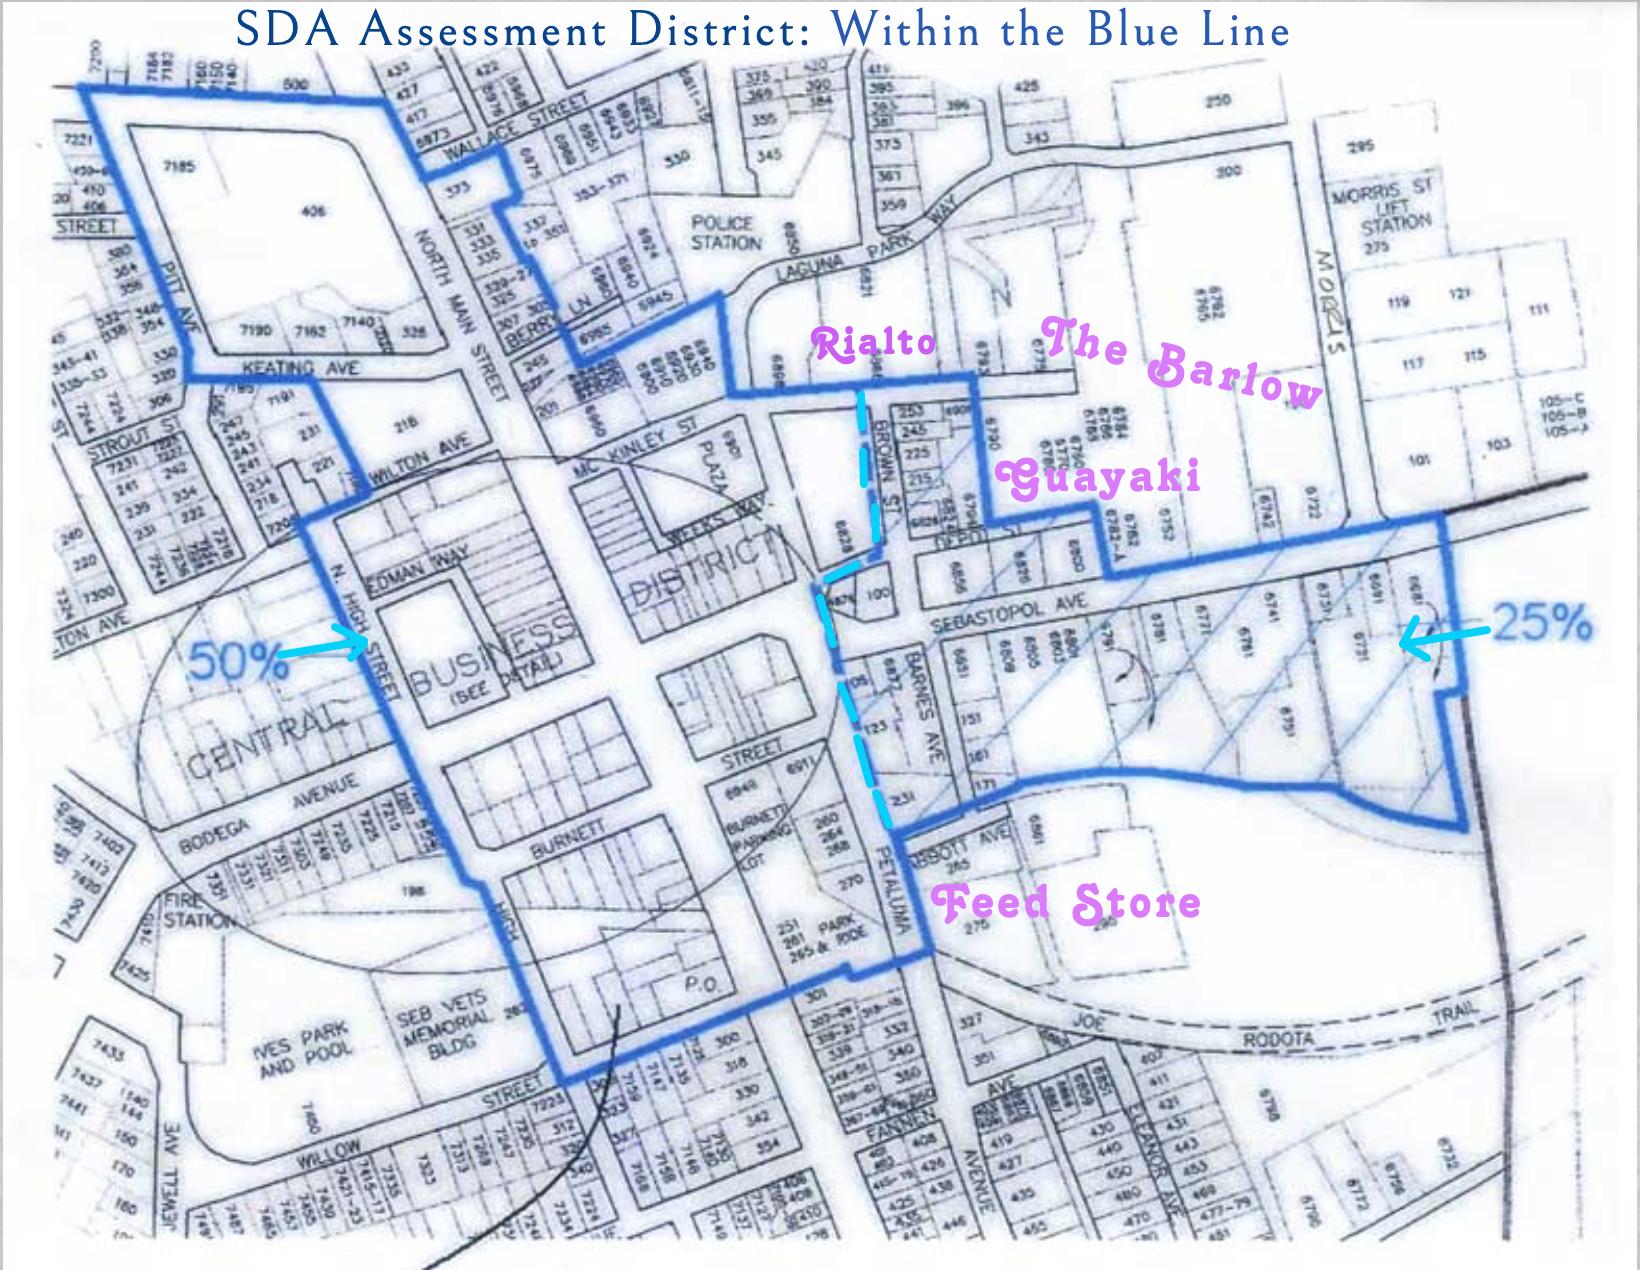 SDA-District-Map-Labeled.jpg